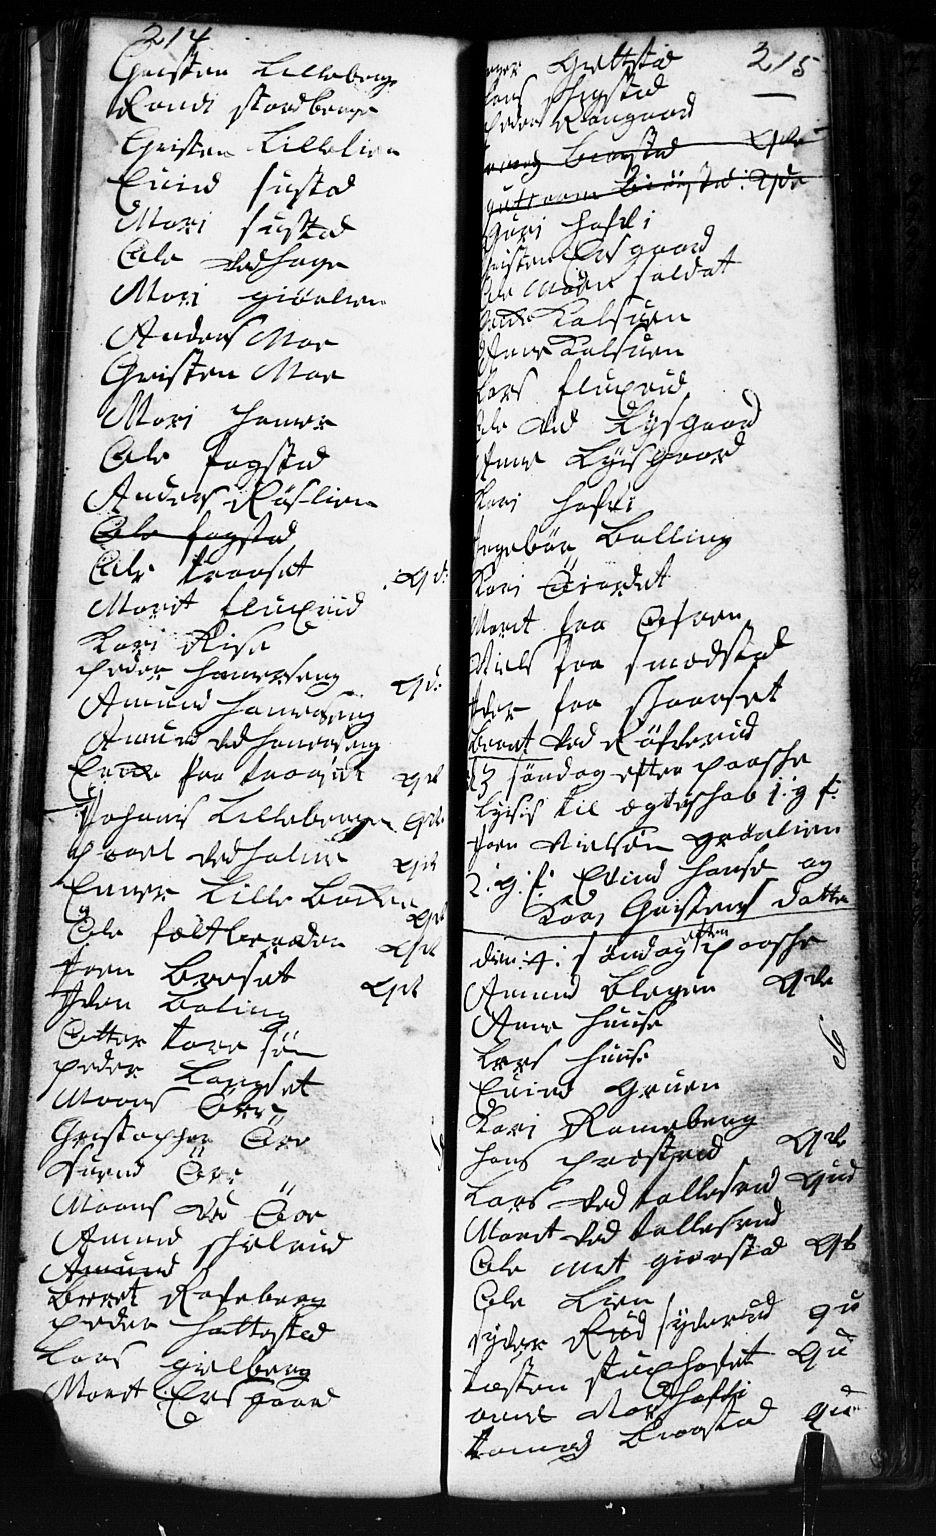 SAH, Fåberg prestekontor, Klokkerbok nr. 2, 1741-1756, s. 214-215